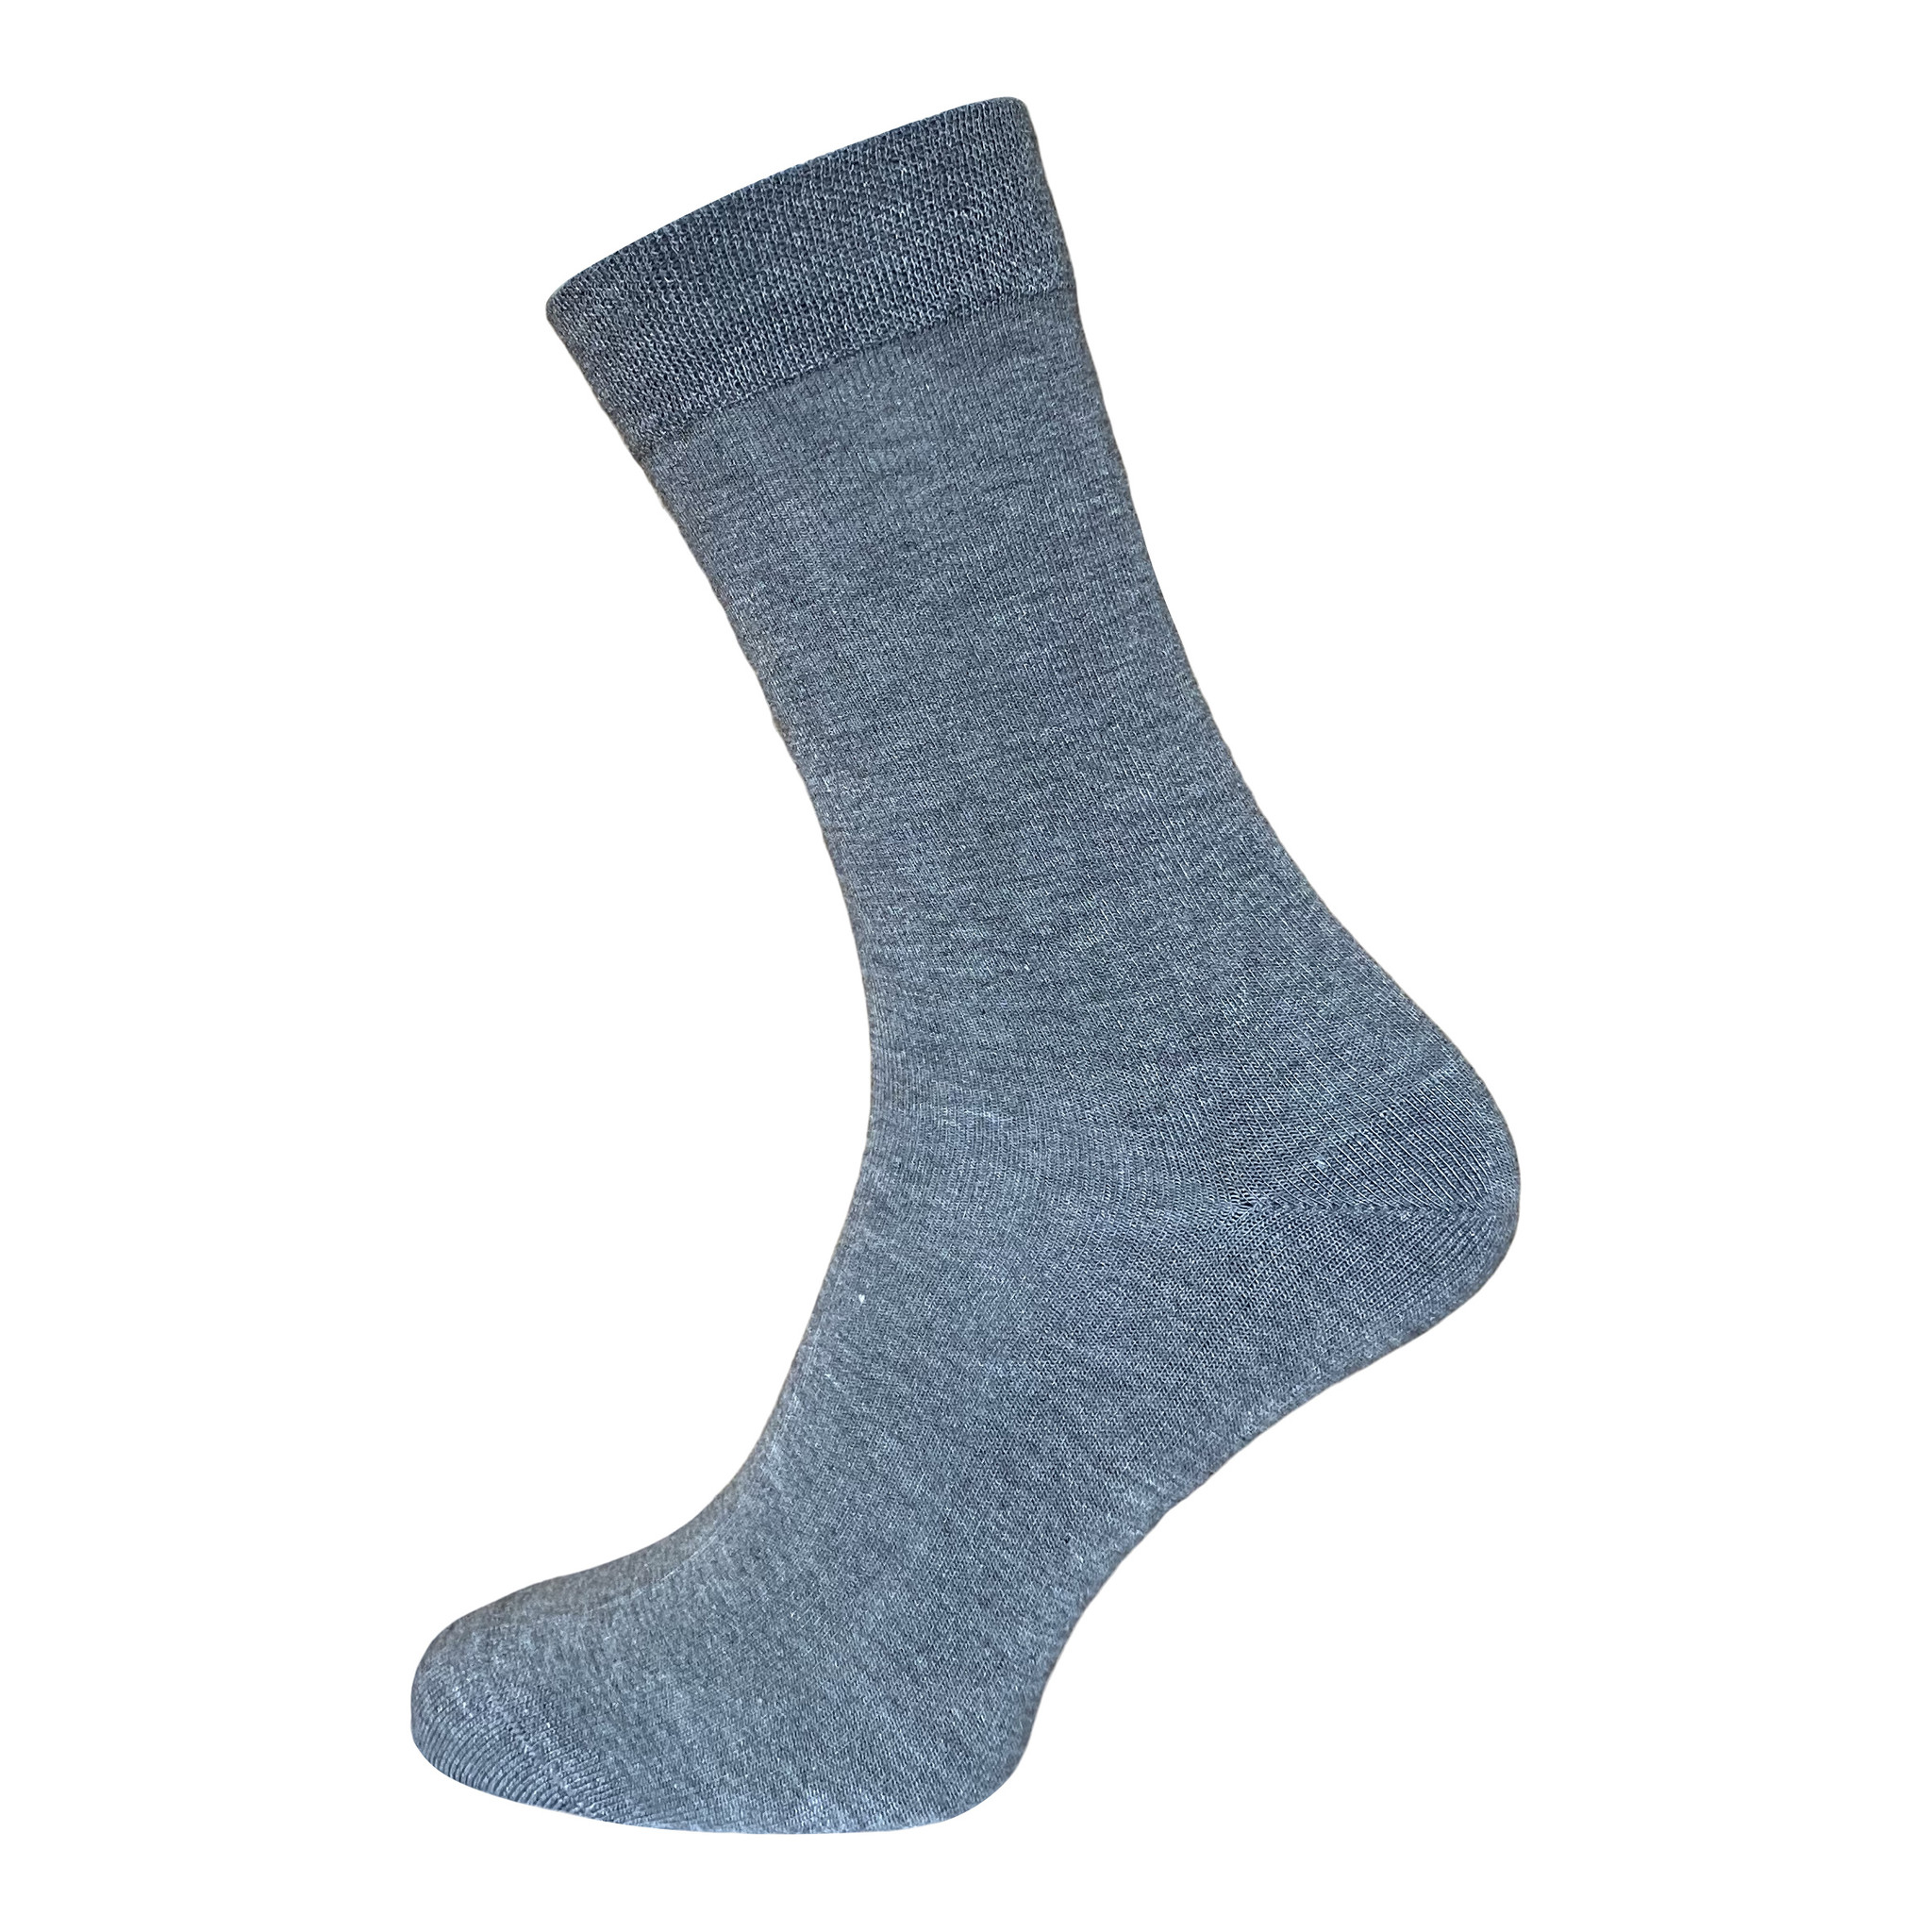 Boru sokken Boru Bamboe sokken - middengrijs